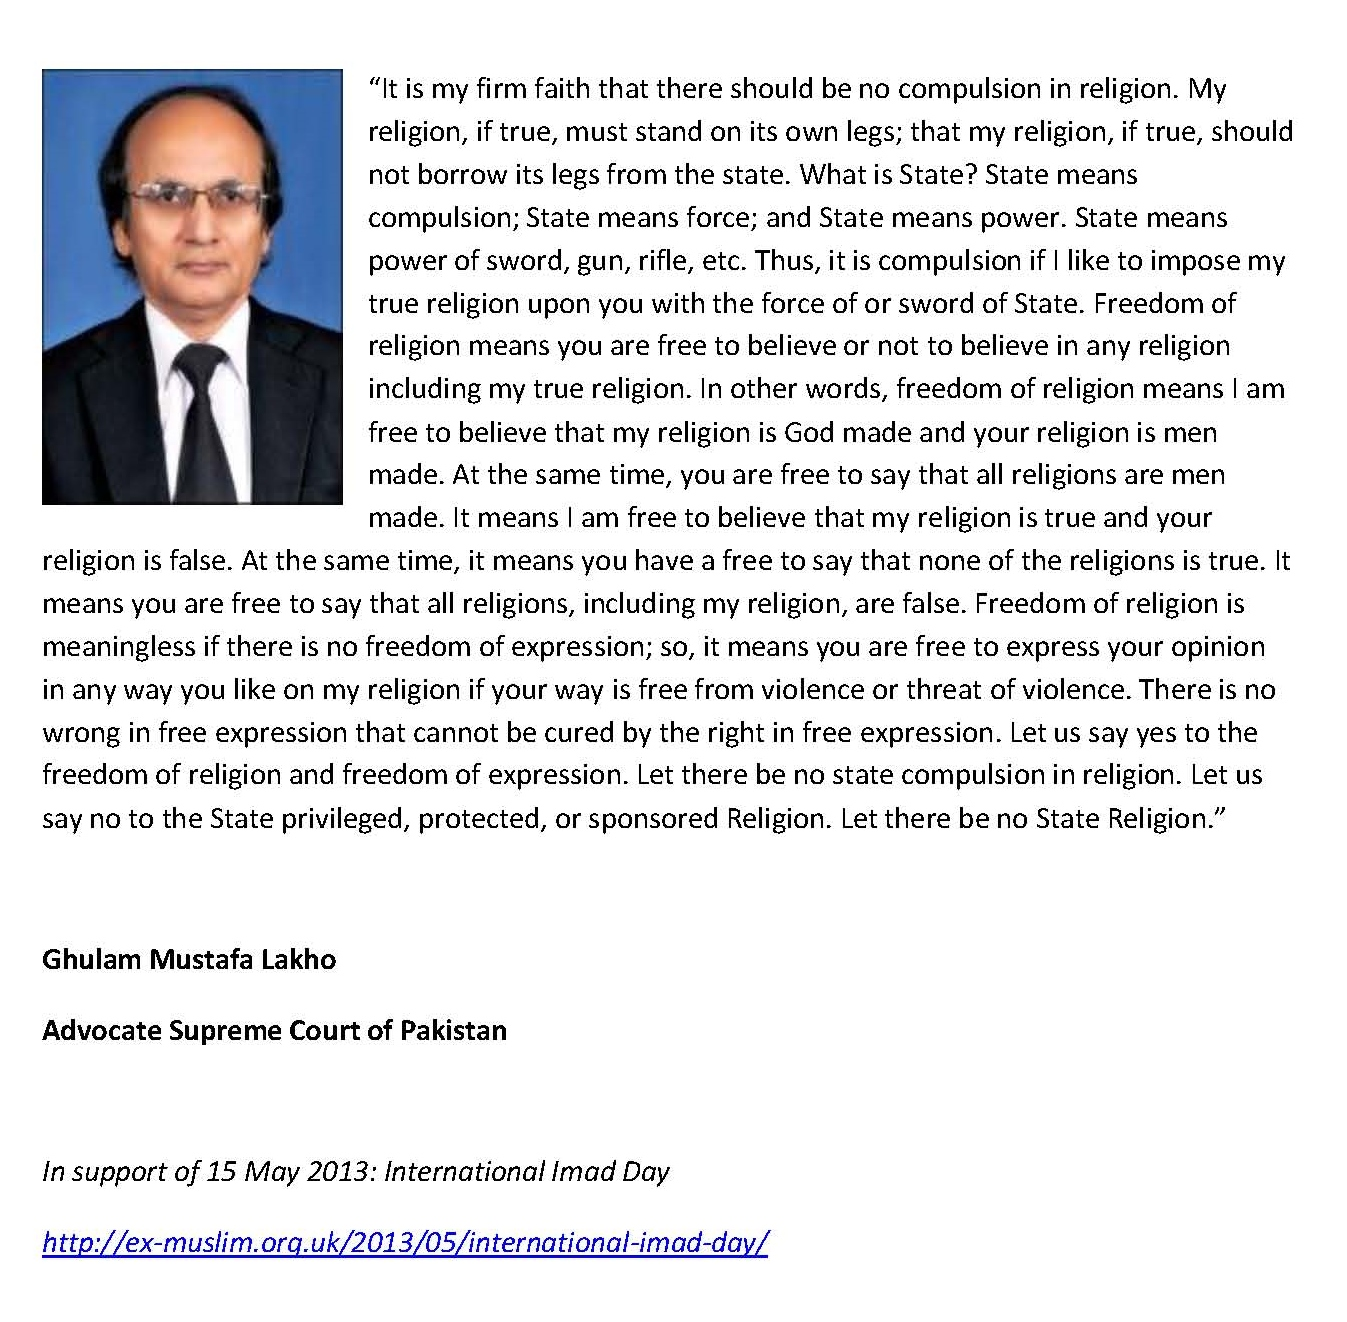 Ghulam Mustafa Lakho statement